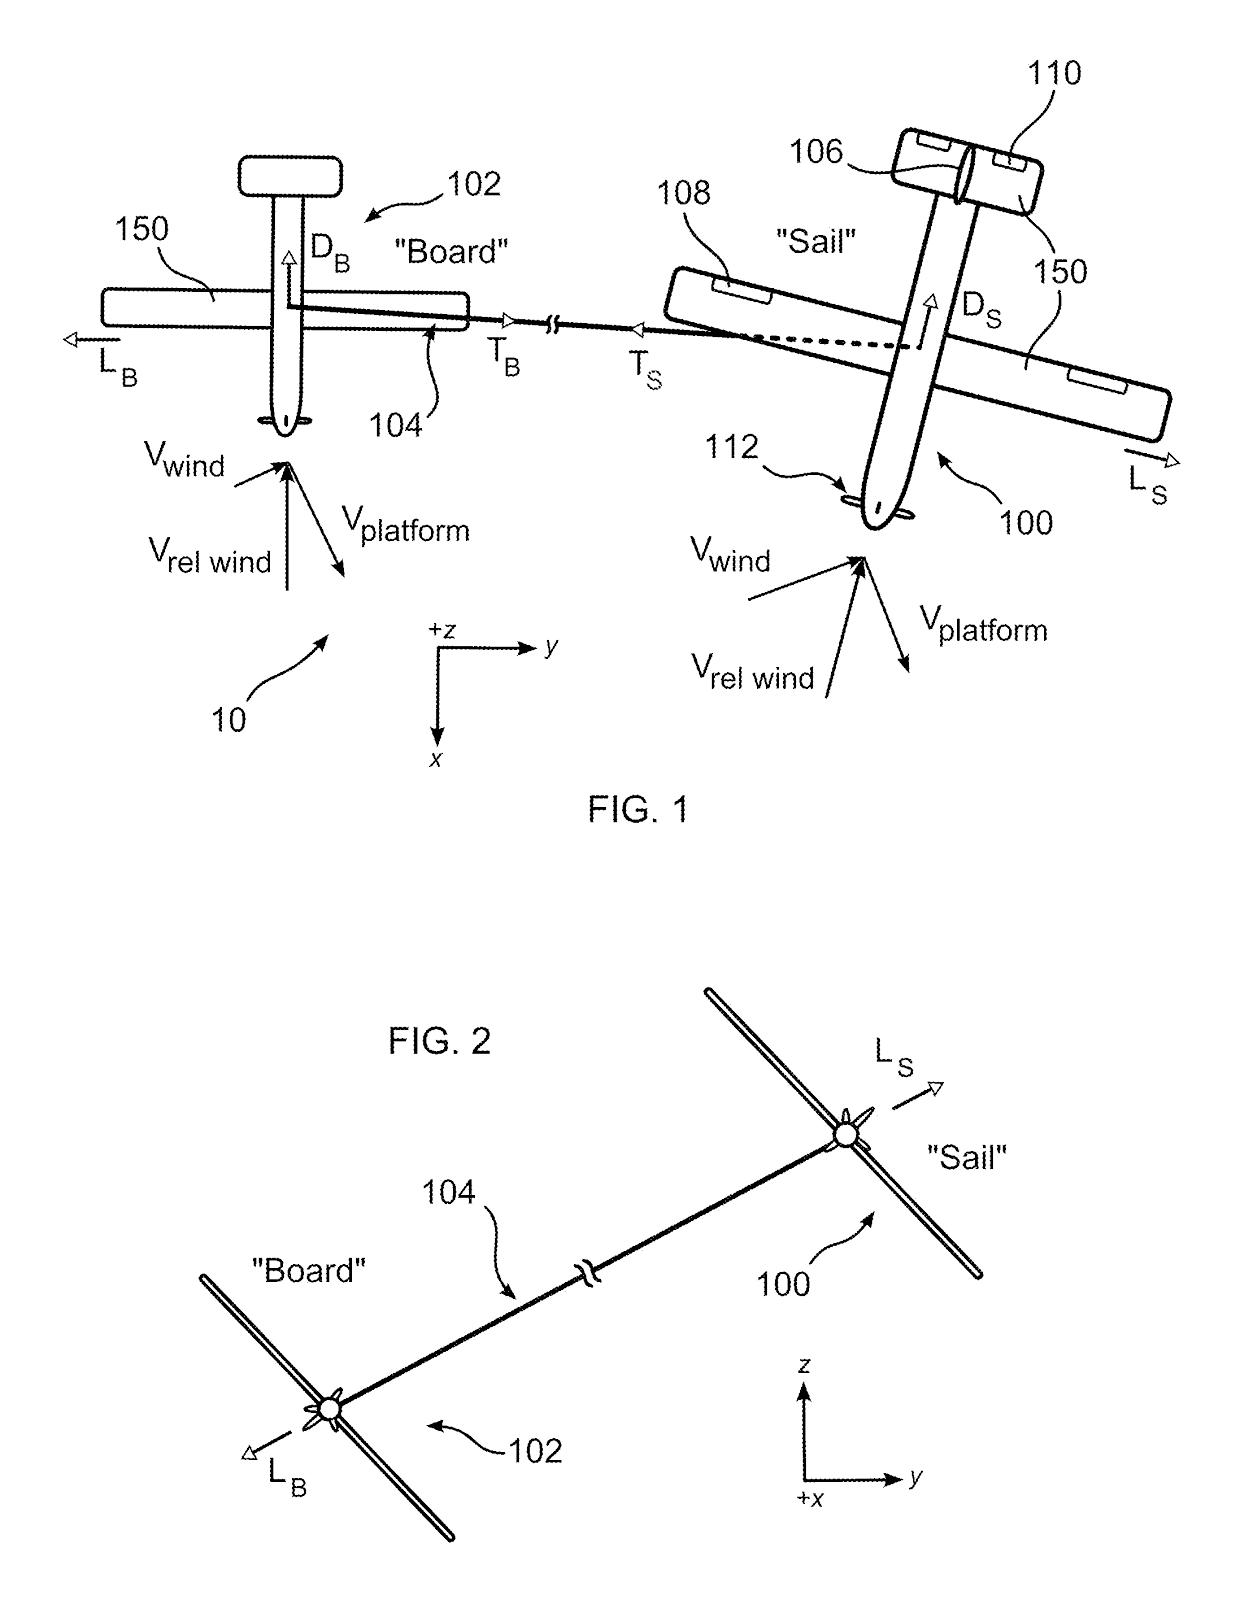 avionics wiring diagram symbols image collection avionics wiring diagram symbols collections